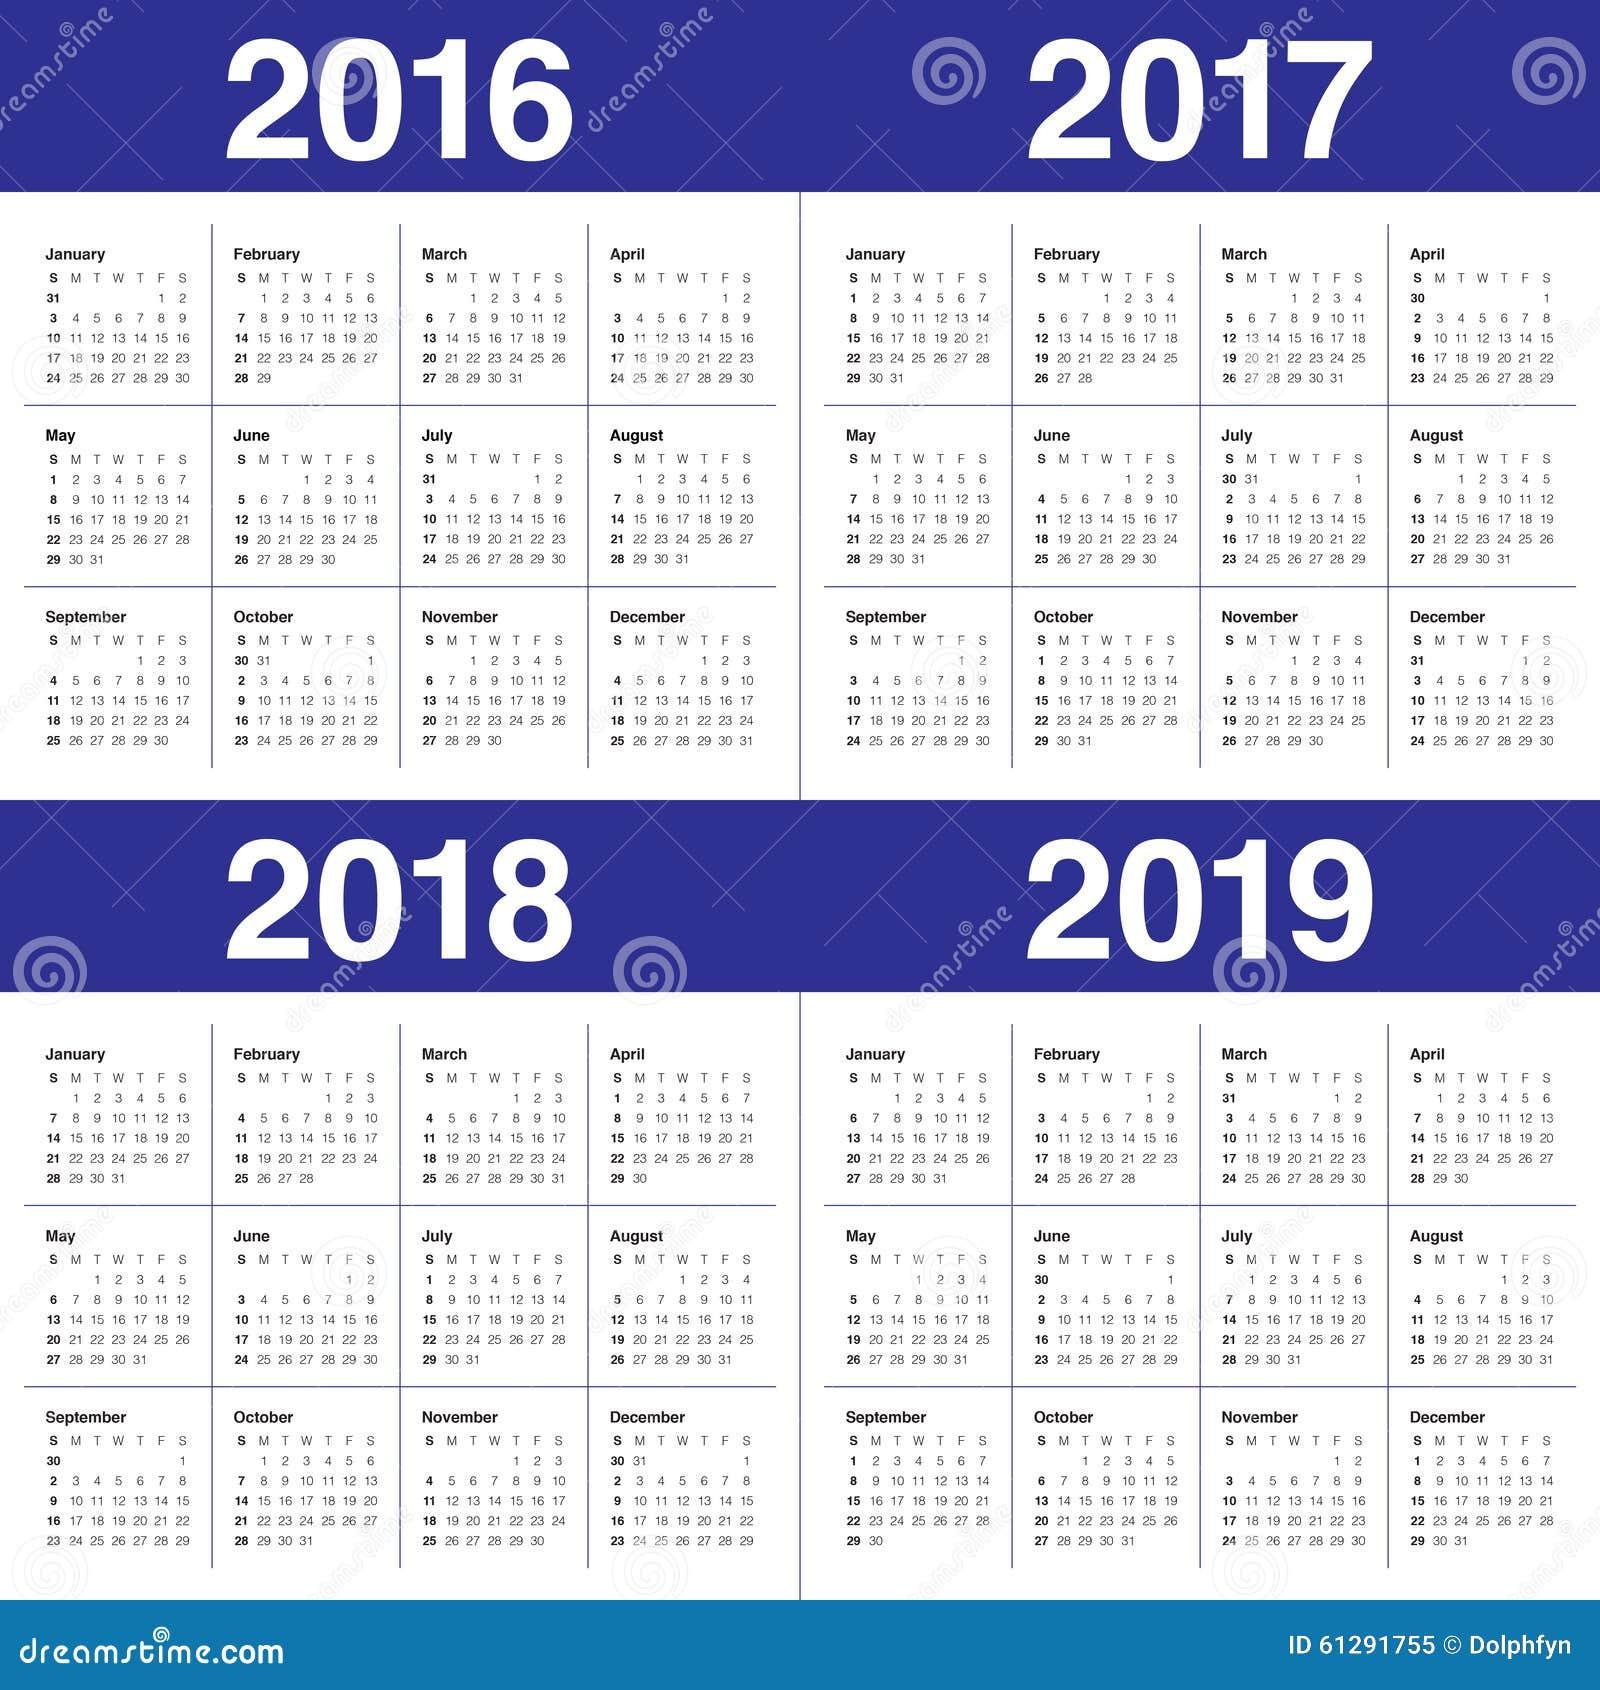 Kalender 2016 2017 2018 2019 Stockbild - Bild von monat ...